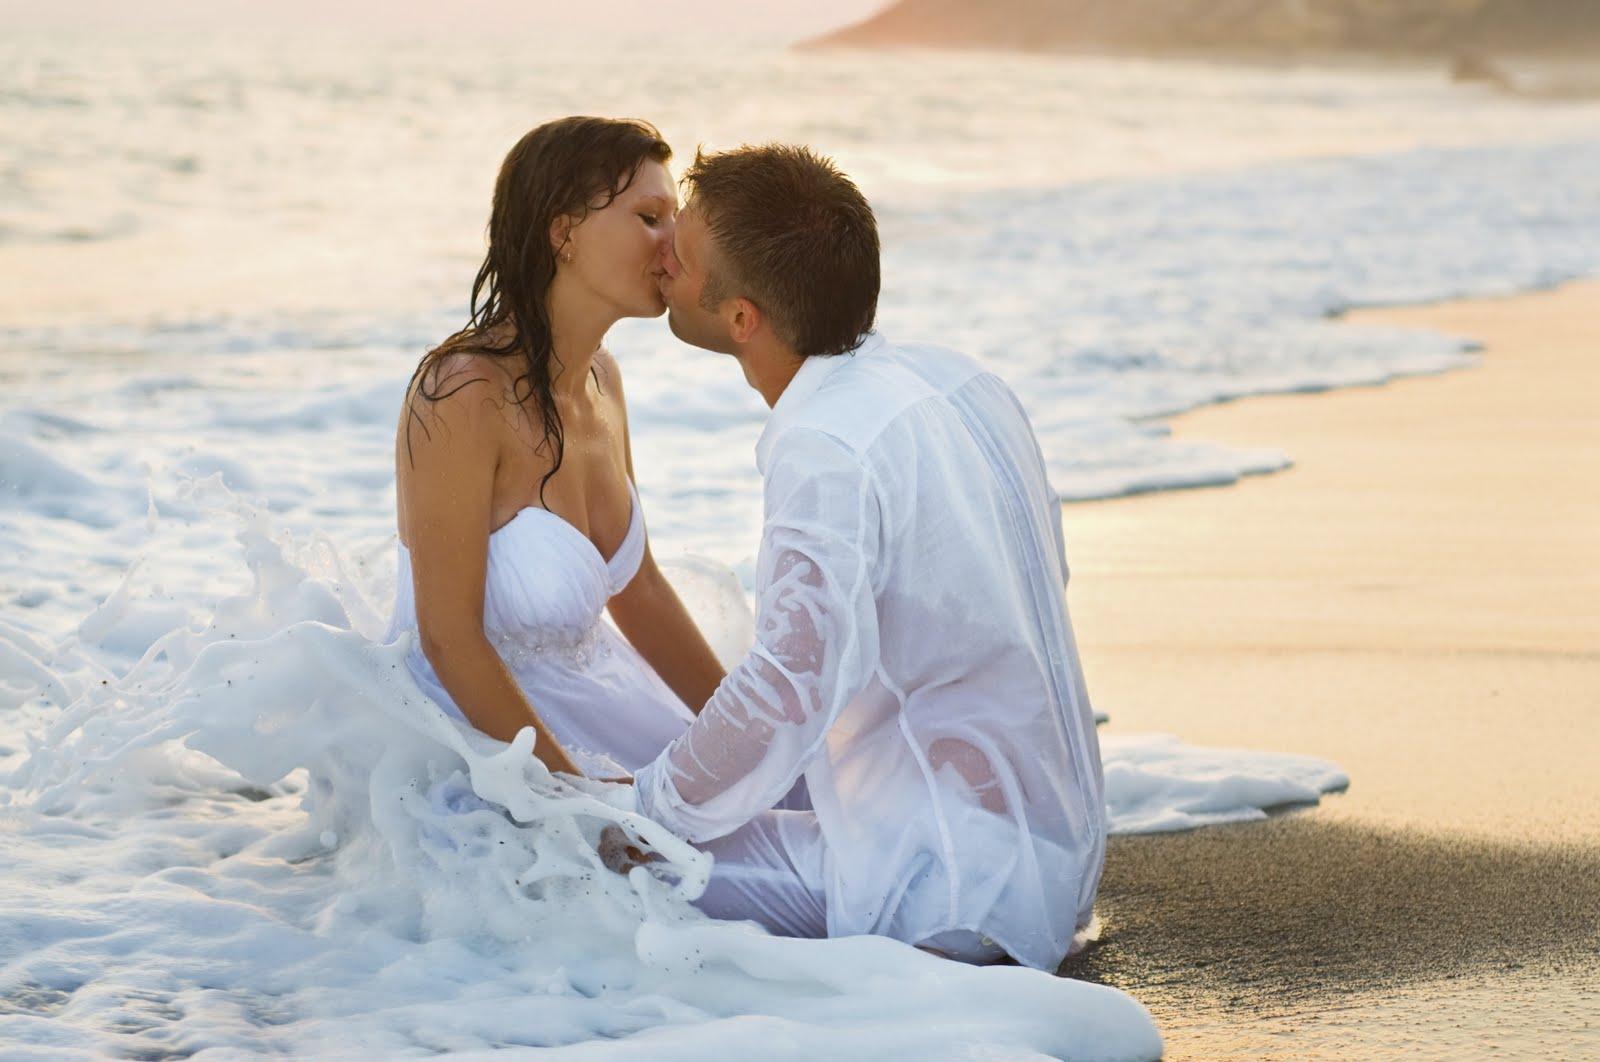 Romantic Kiss Desktop Wallpapersfree Wallpapers